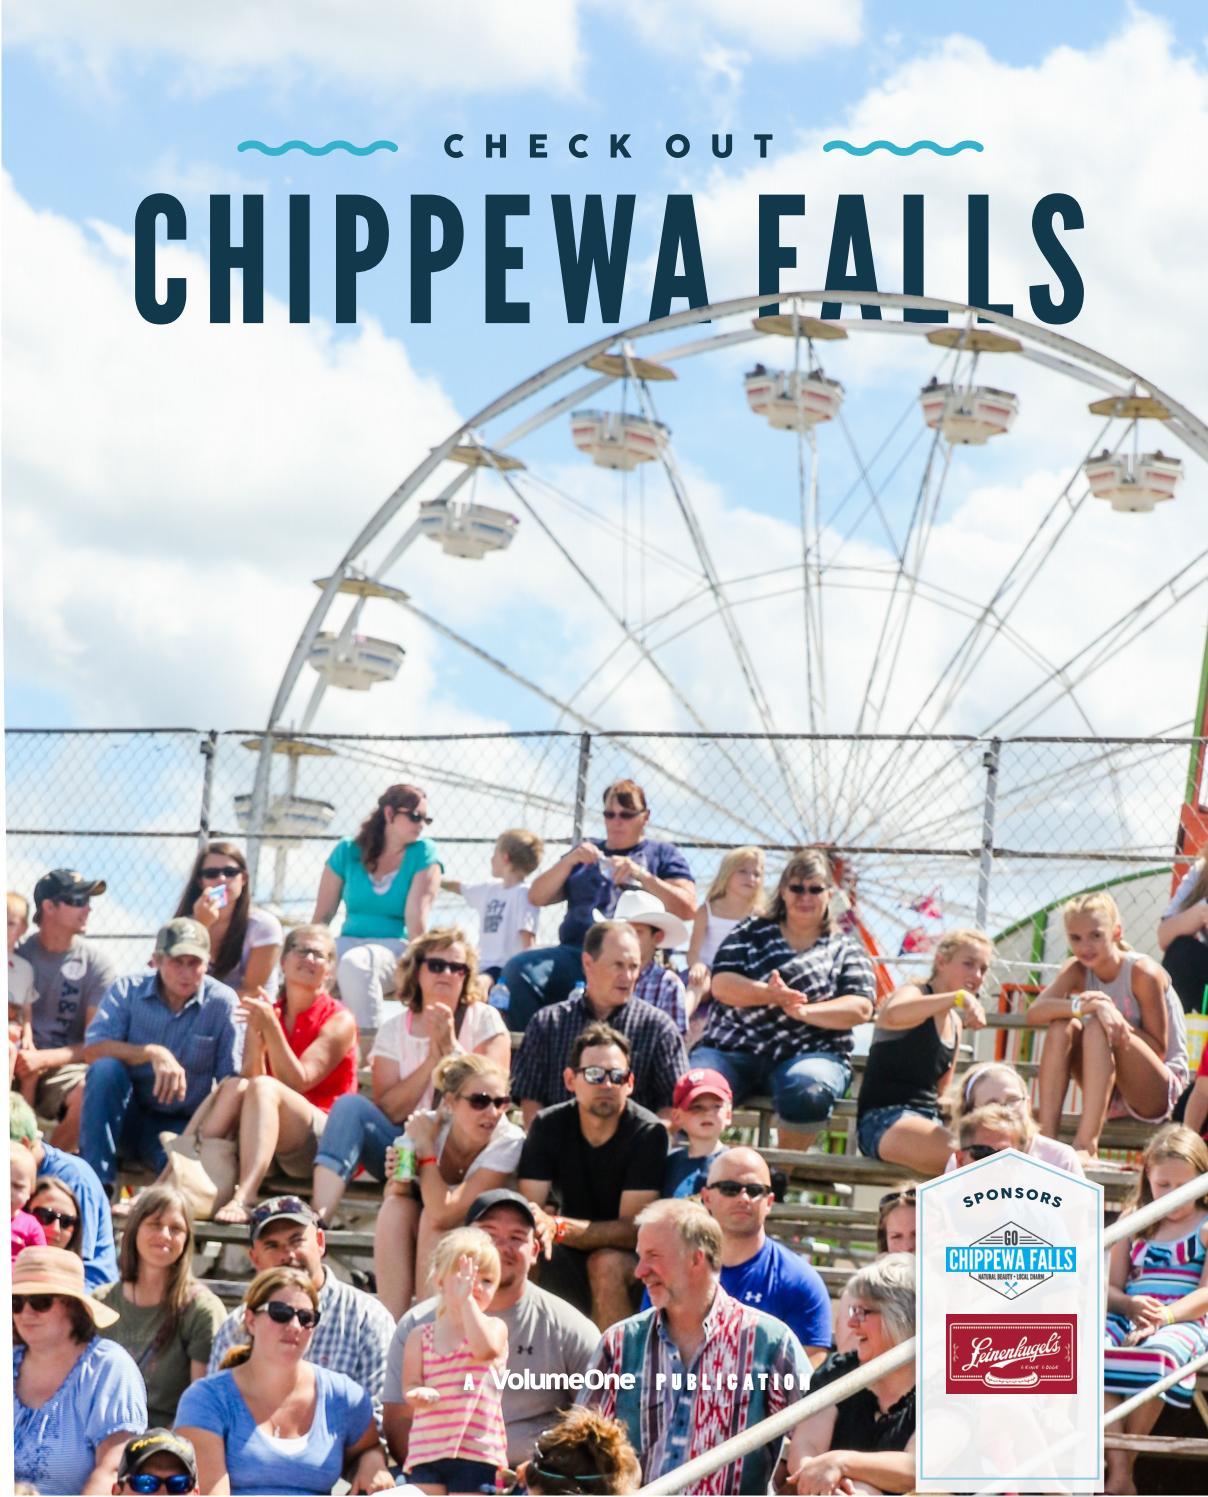 Check Out Chippewa Falls 2017 by Volume One Magazine - issuu